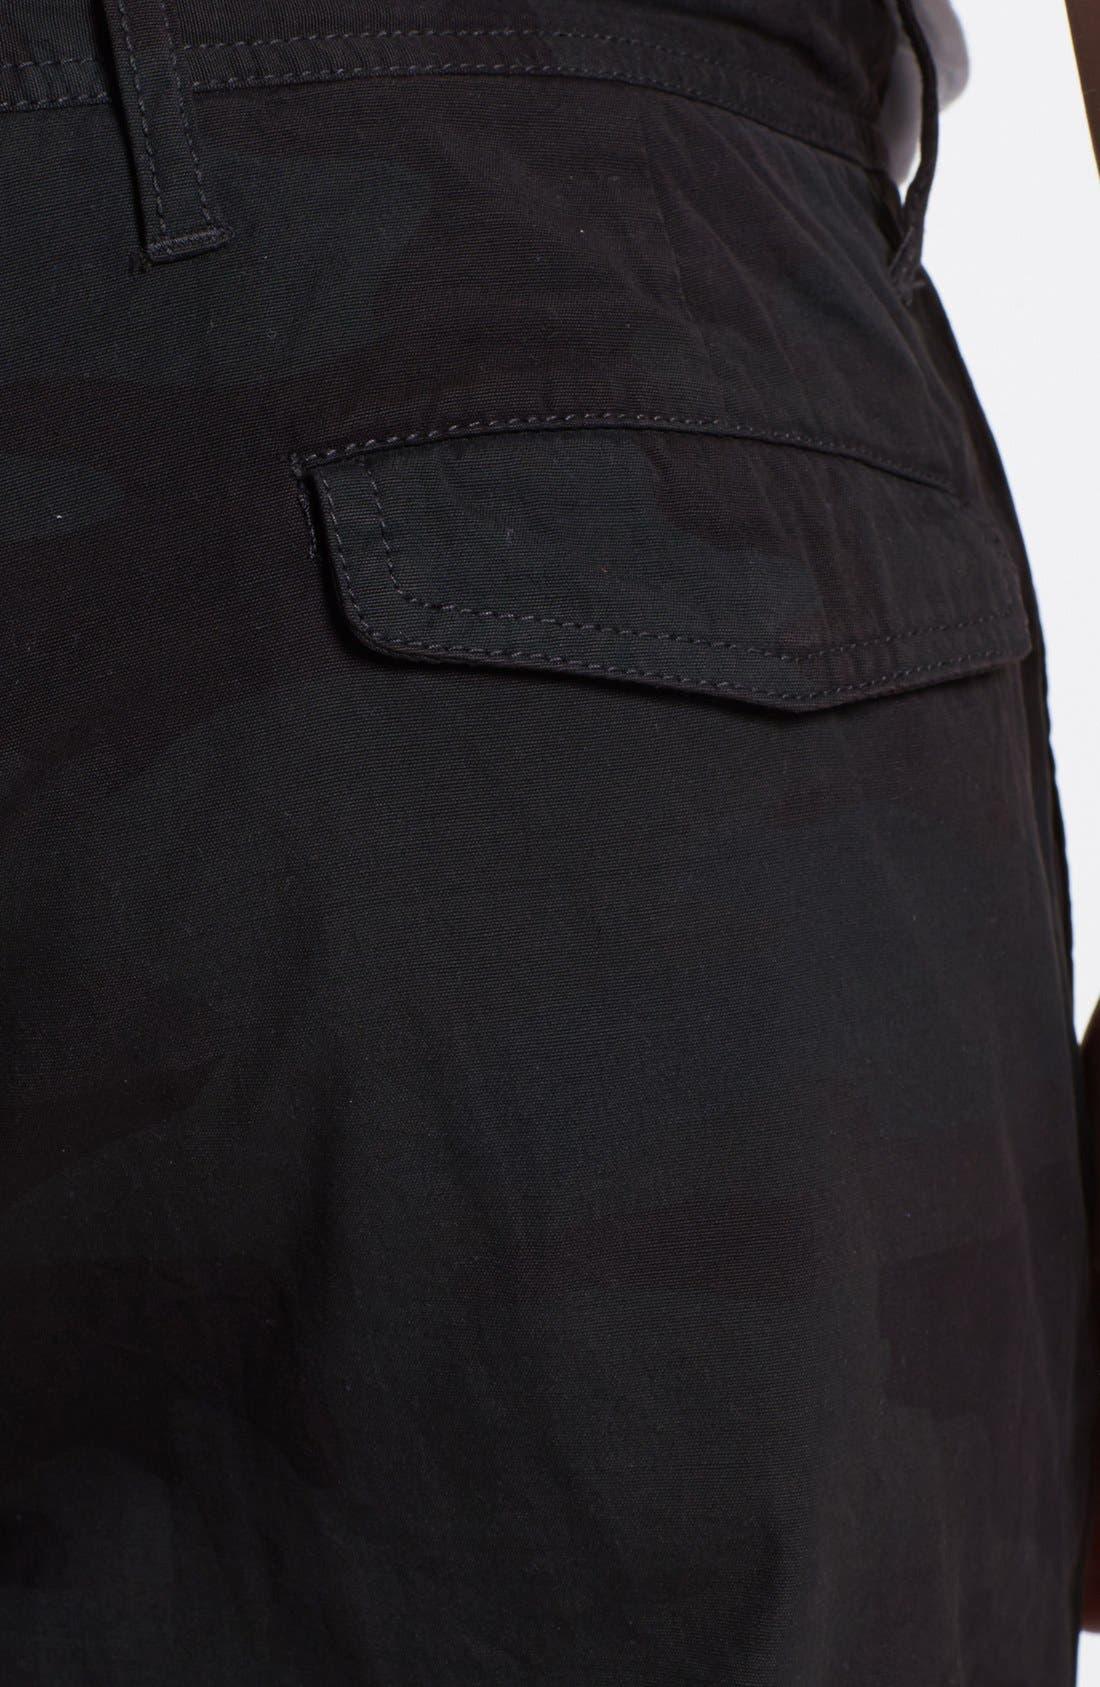 Alternate Image 3  - Wallin & Bros. 'Riverbend' Camo Cargo Pants